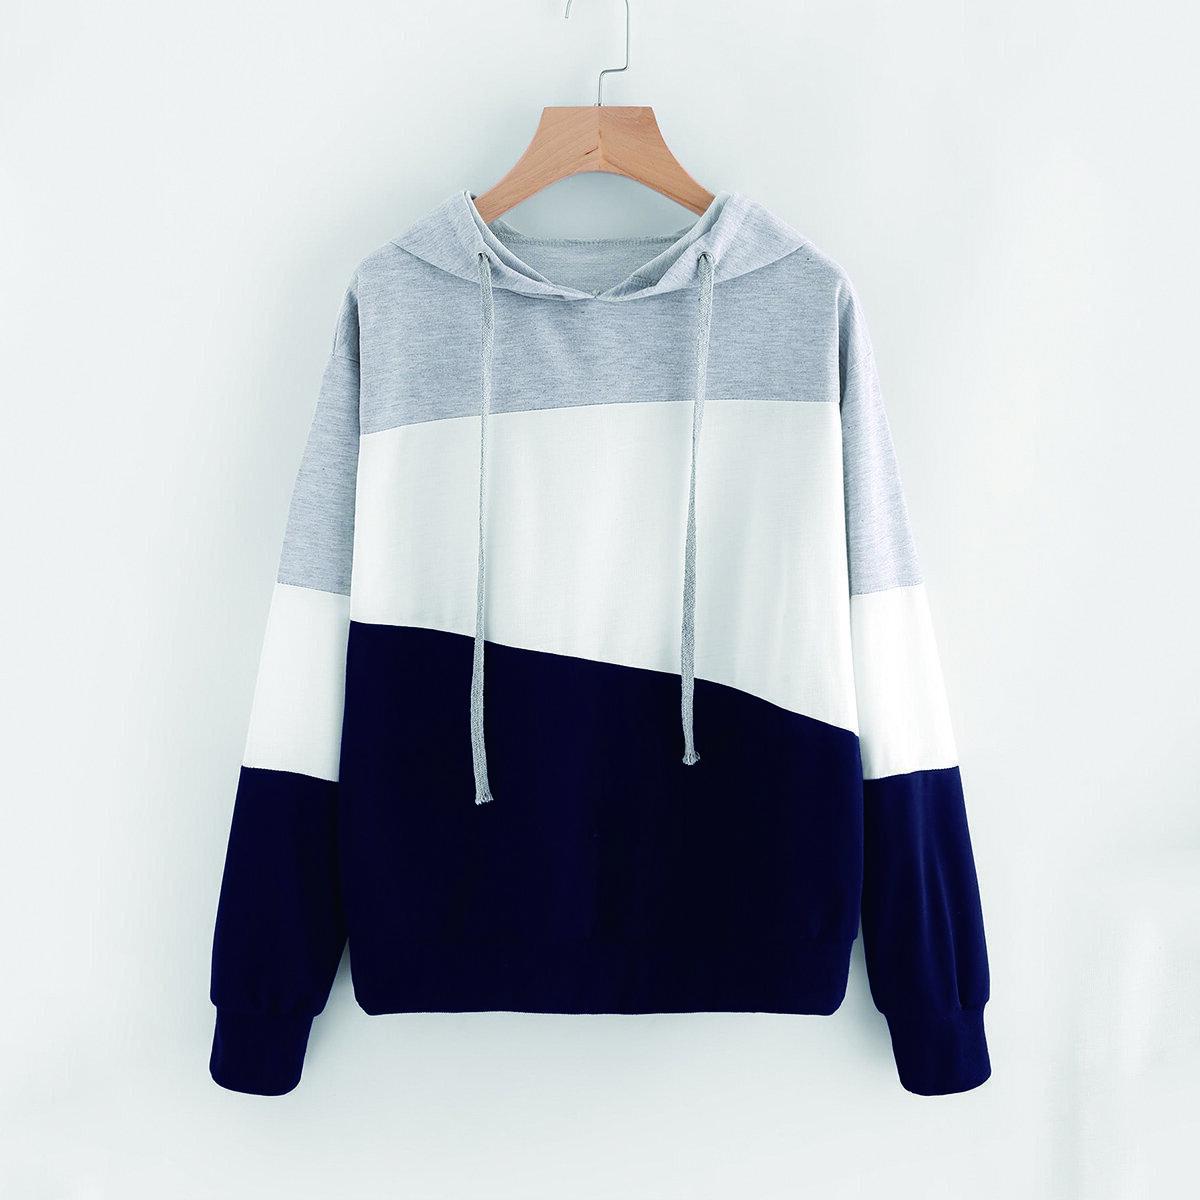 Sweatshirt met kap en driekleurig